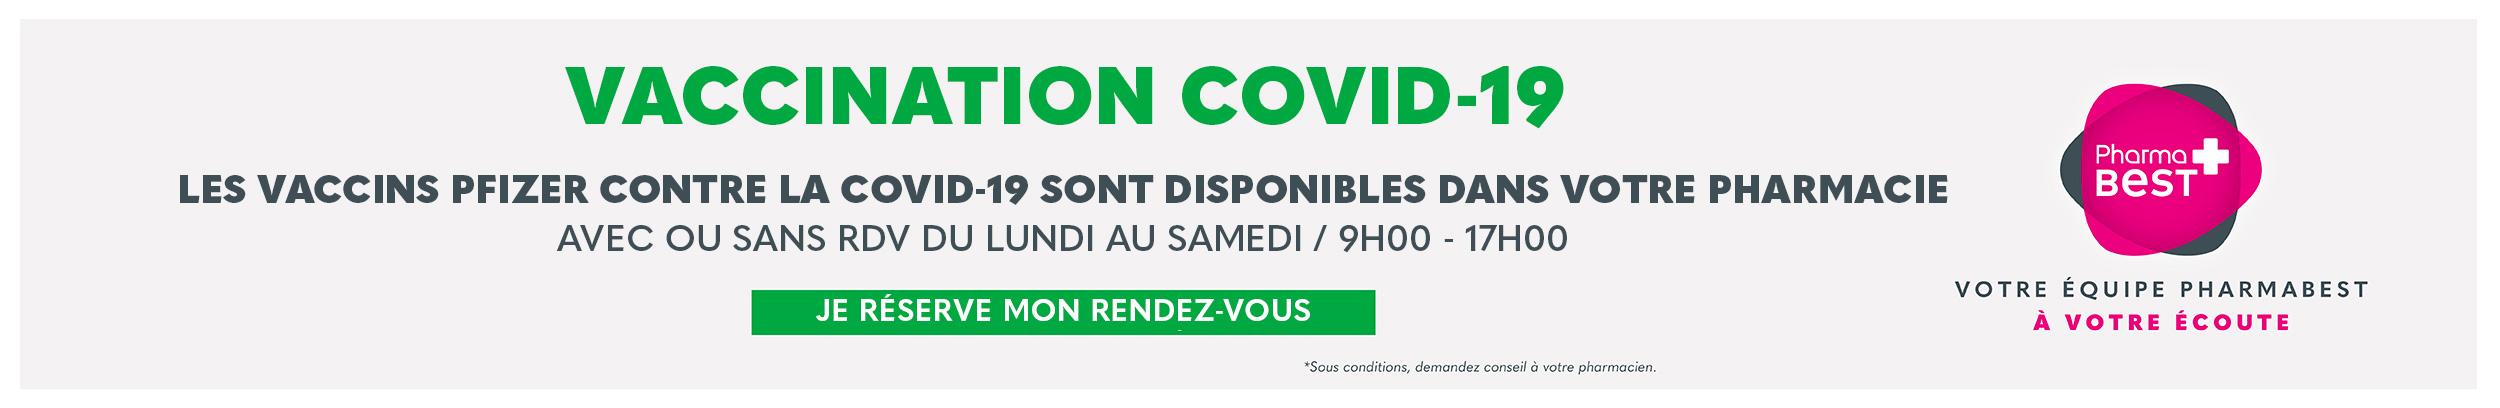 Vaccination COVID19 - Fort de France